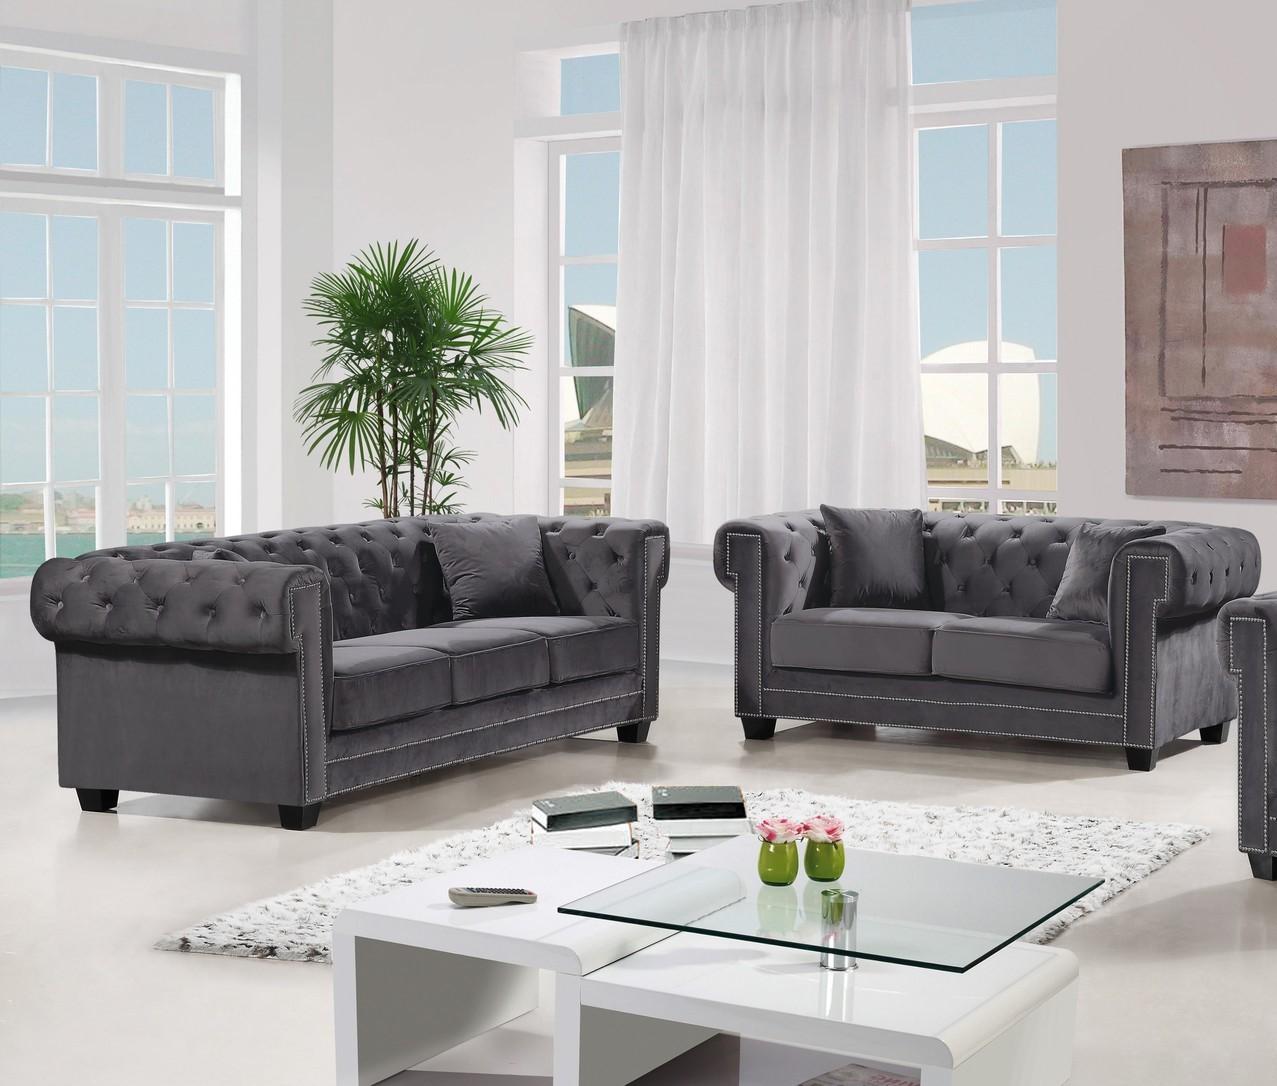 New Modern Design 2pc Set Sofa Loveseat Gray Velvet Fabric Soft Deep Comfortable Seating Living Room Furniture